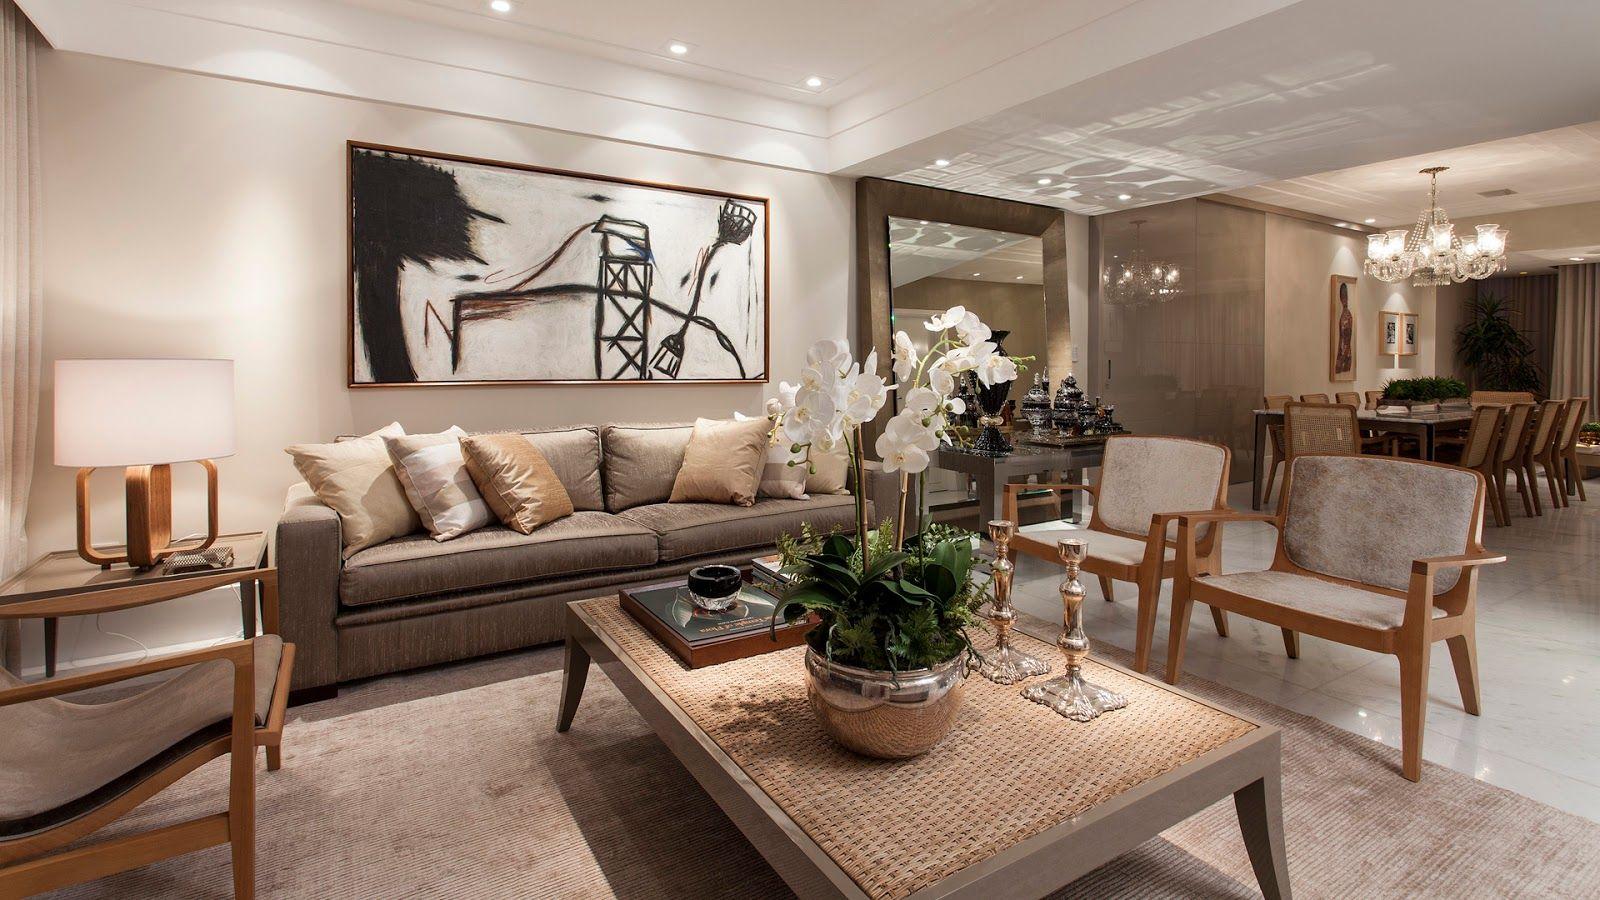 Salas de estar jantar tv bate papo e varanda decoradas - Sala de estar ...